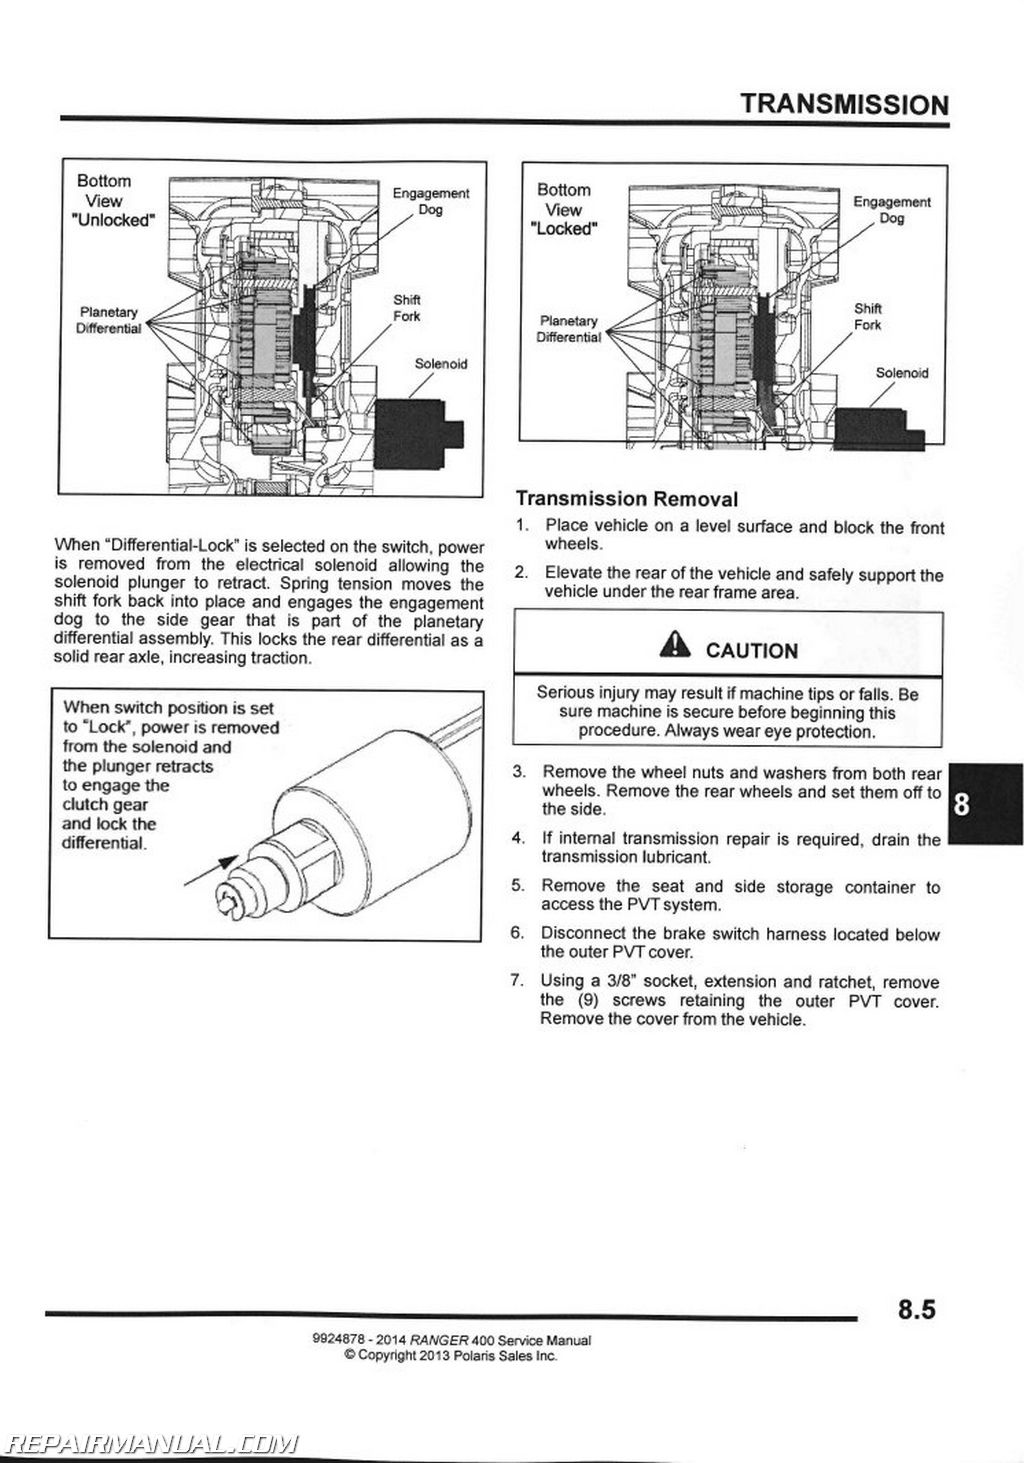 atv manuals free downloads